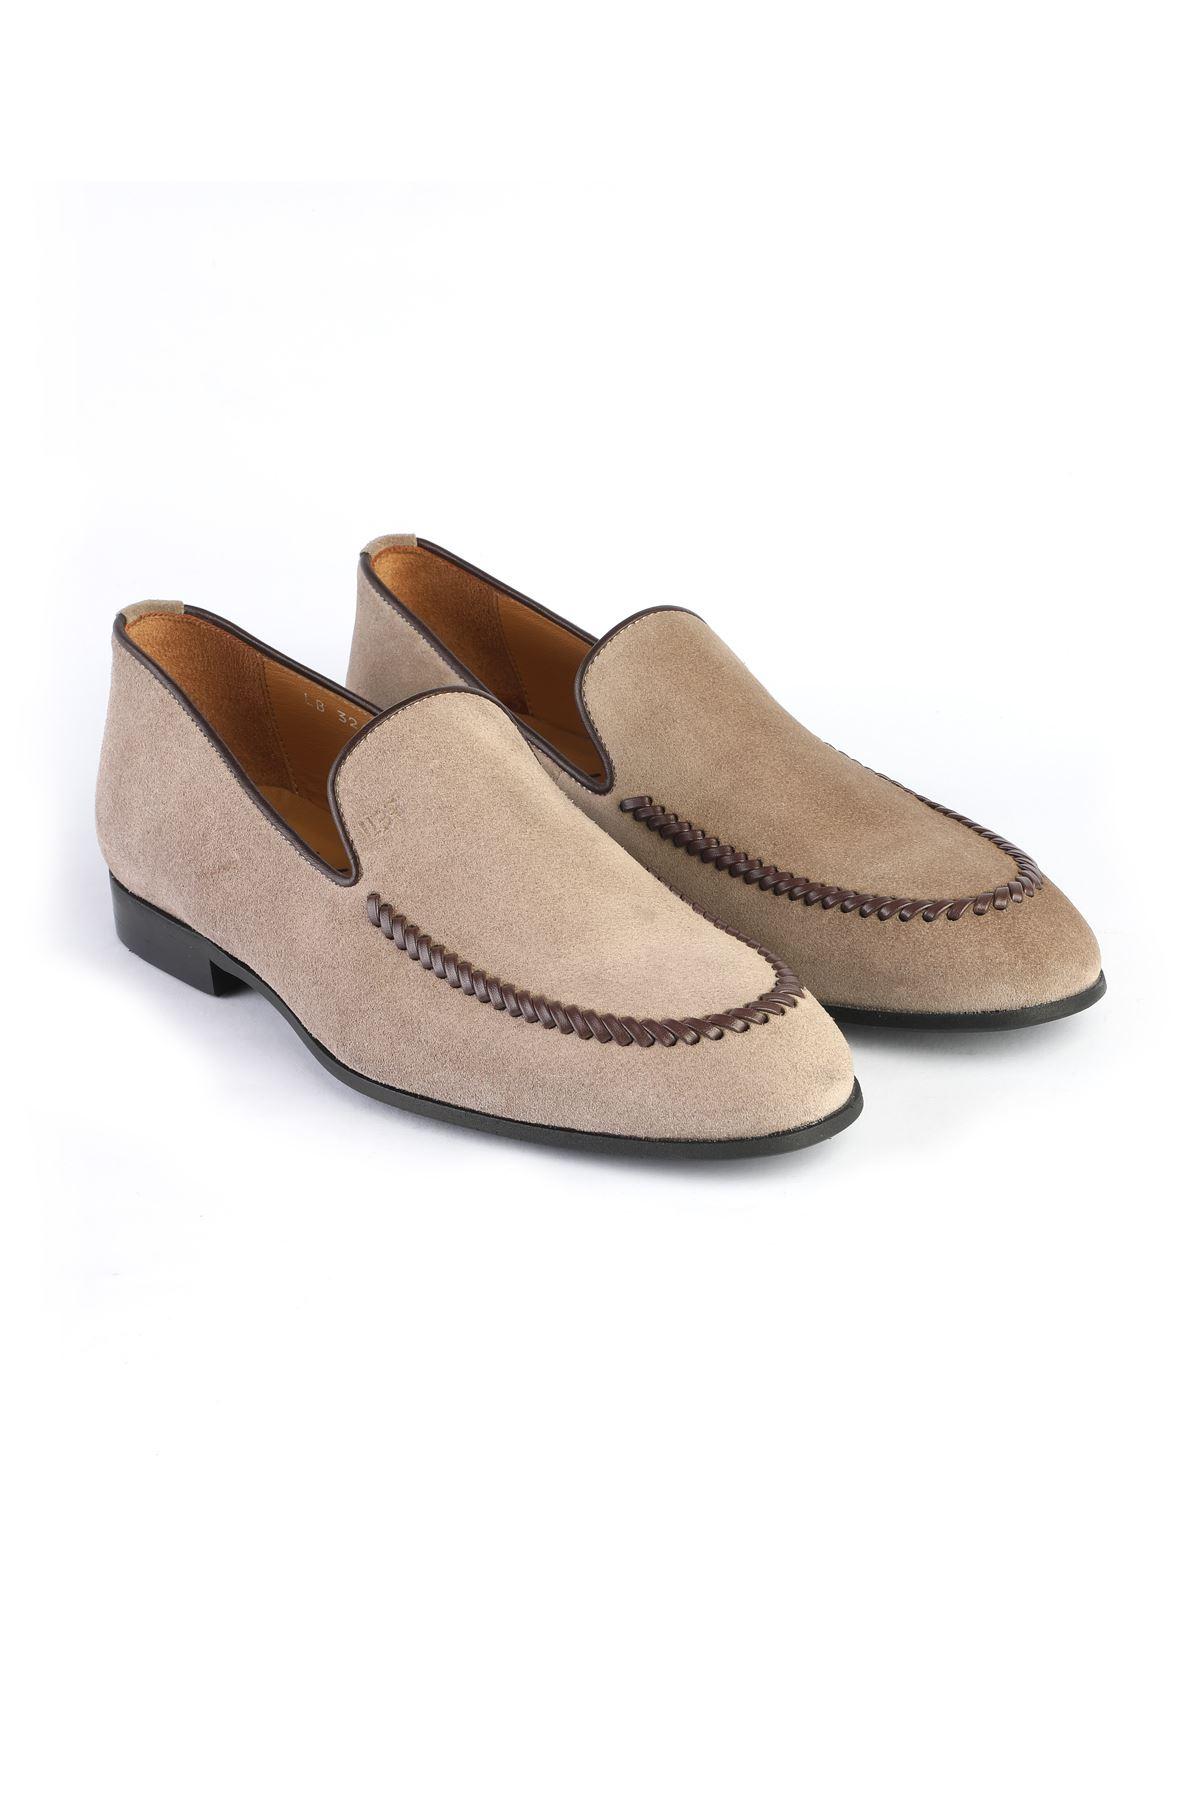 Libero 3260 Mink Loafer Shoes